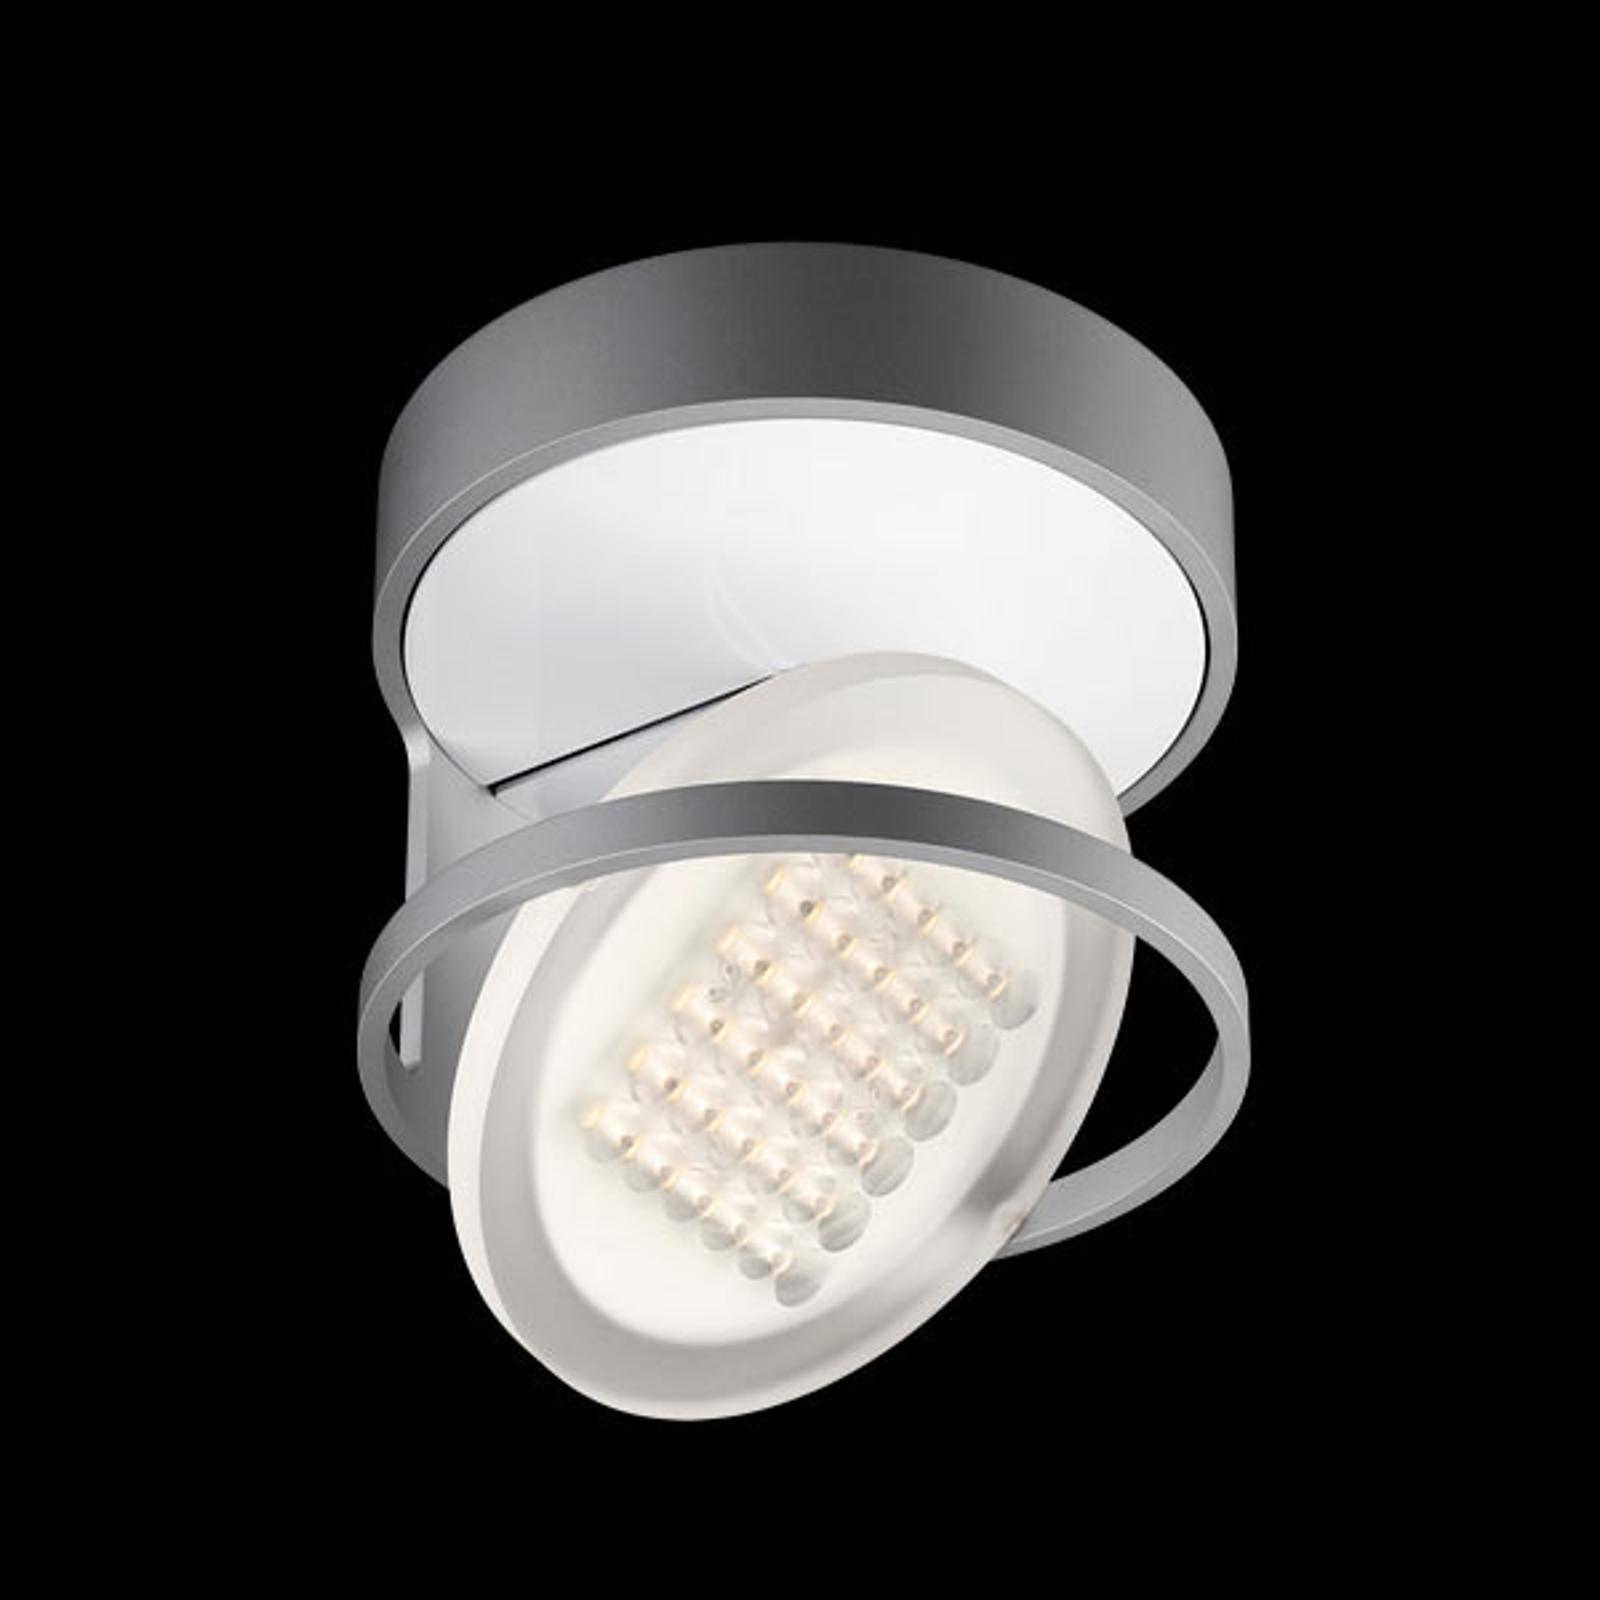 Nimbus Rim R 36 lampa sufitowa LED, srebrny tonic